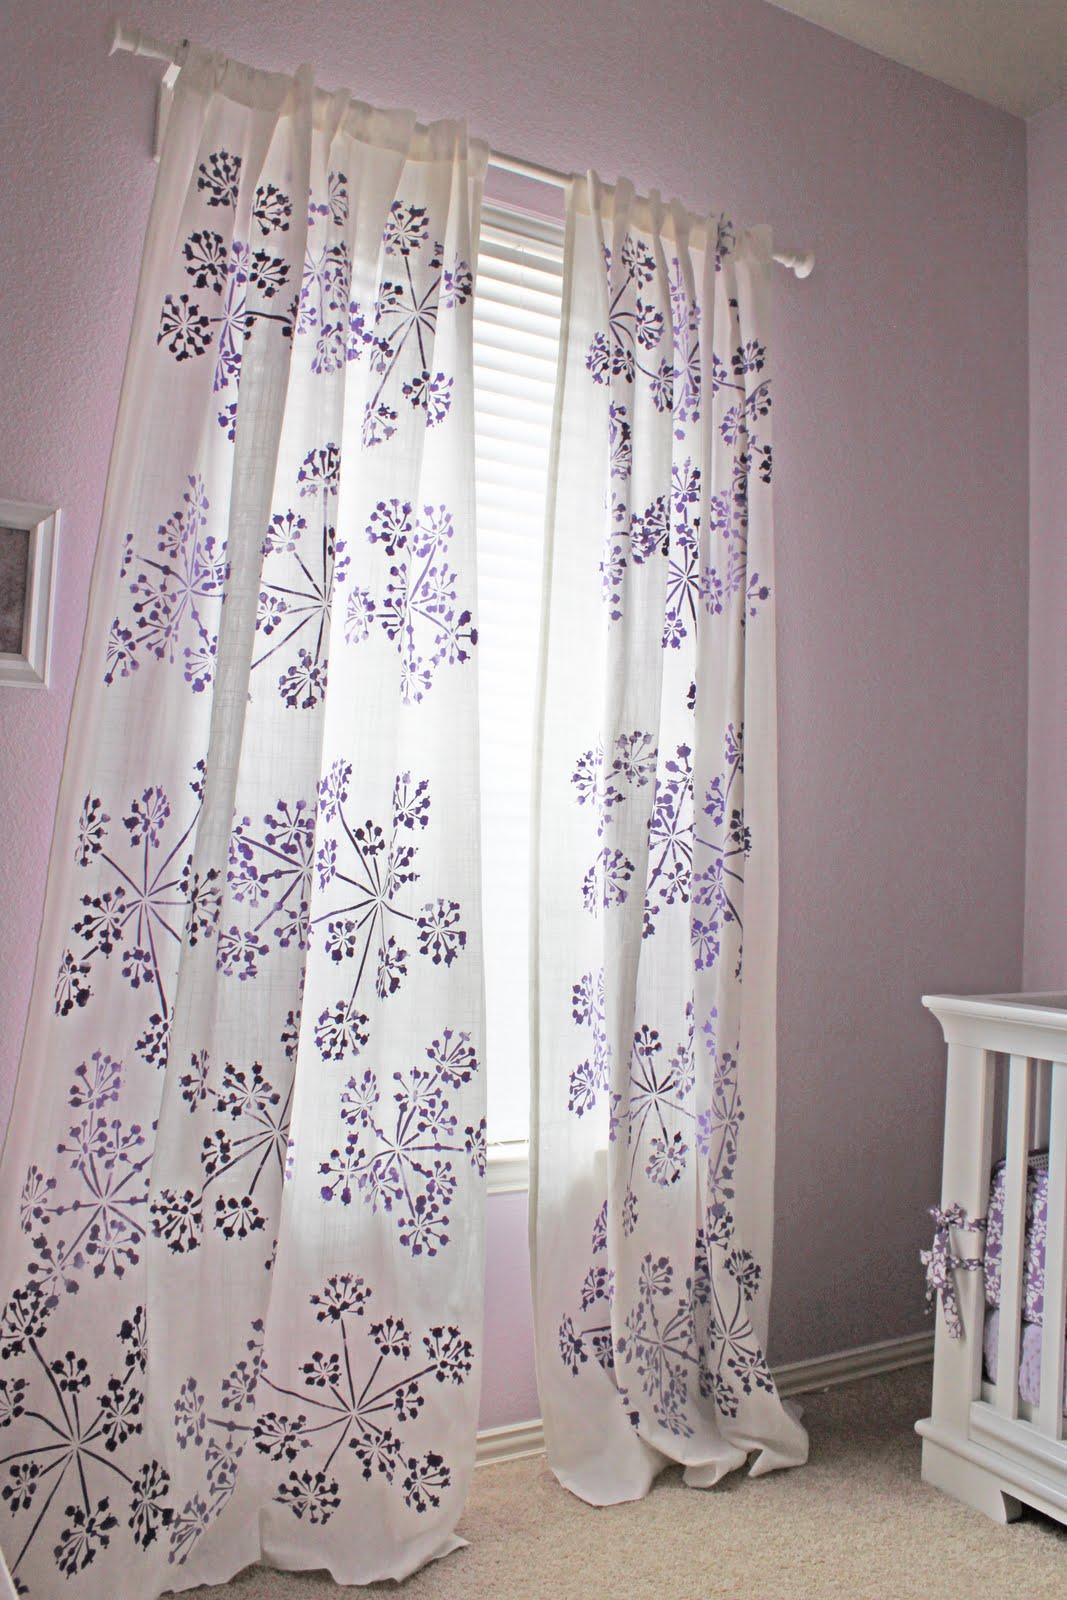 Stenciled-Curtains3 37+ Creative Curtains Design Ideas To DIY